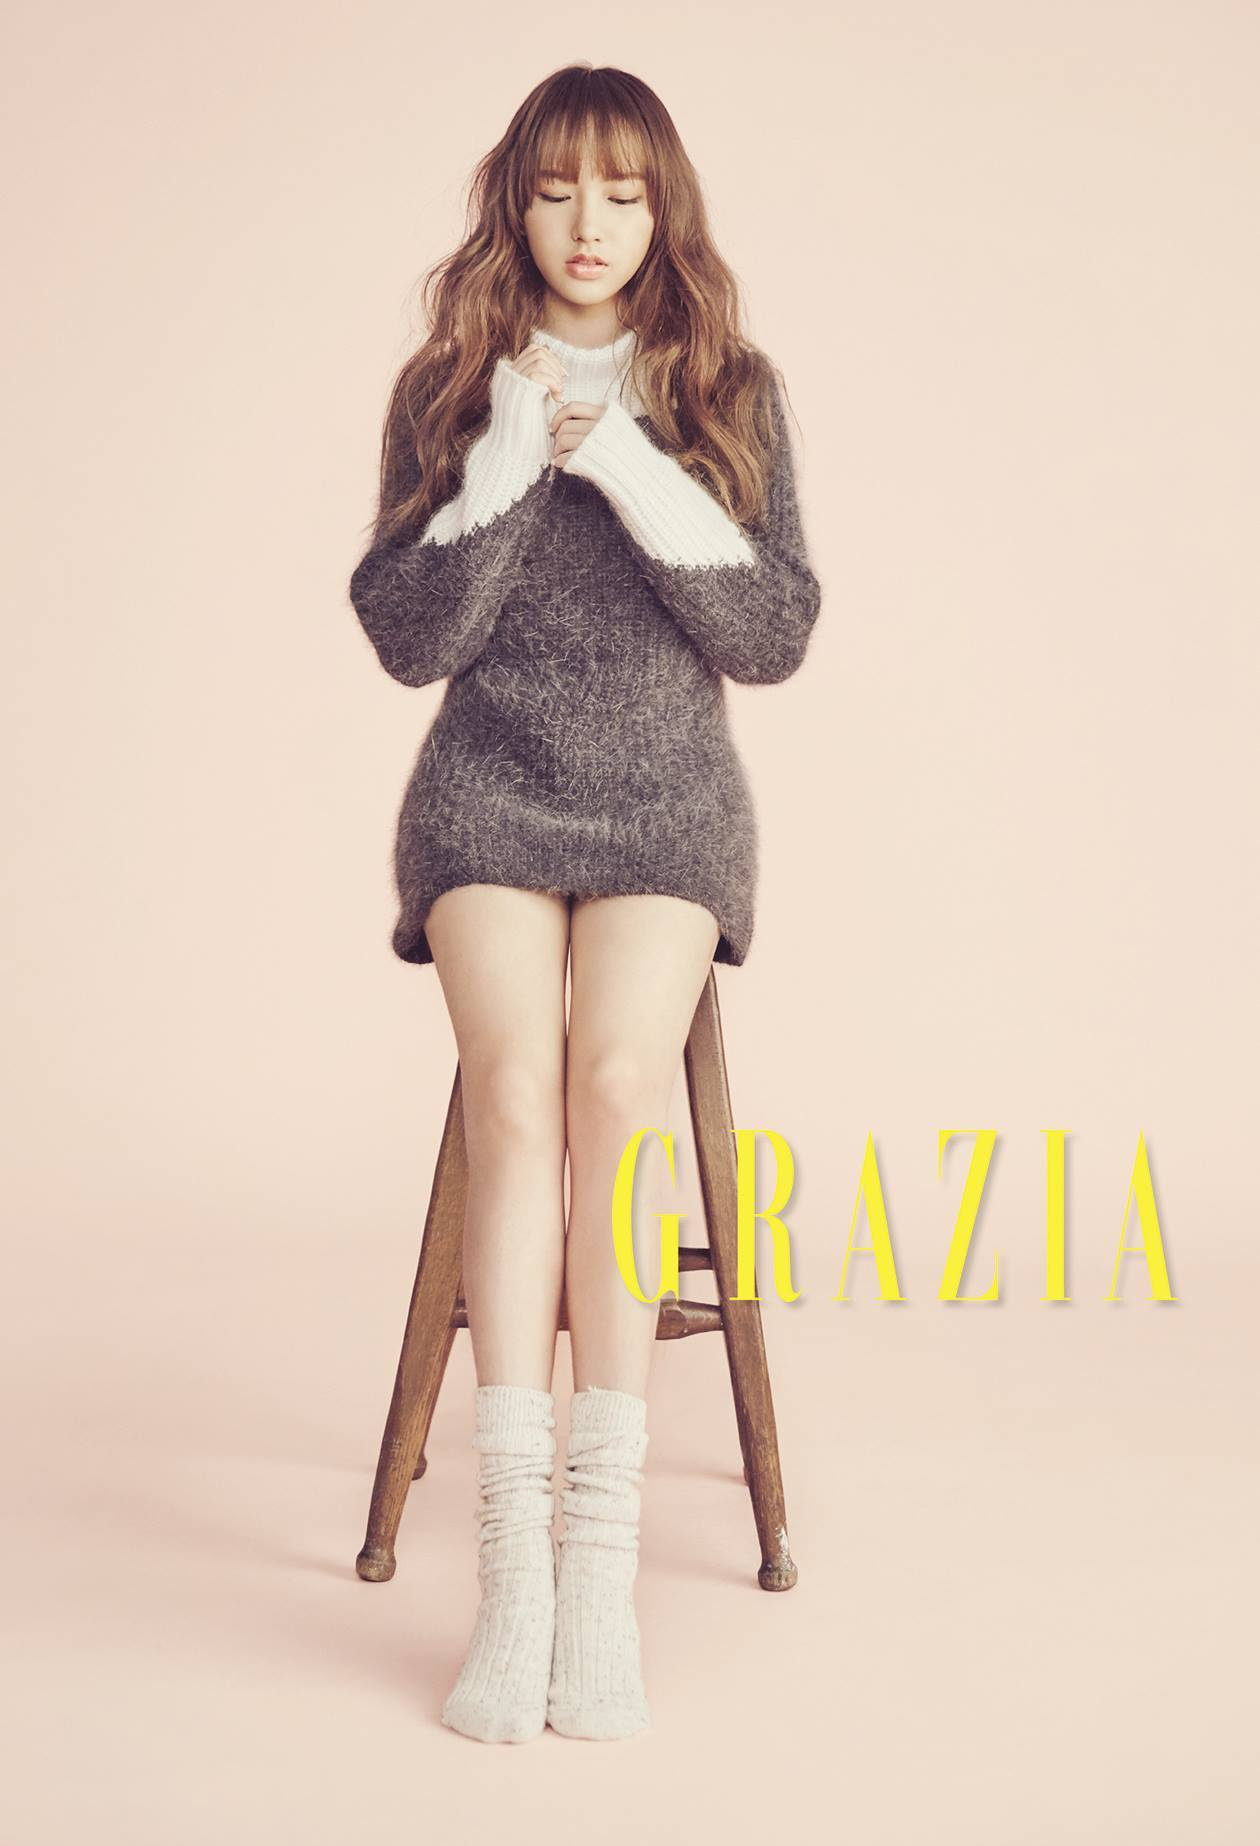 Cheng Xiao (WJSN) - Grazia Magazine November Issue '16